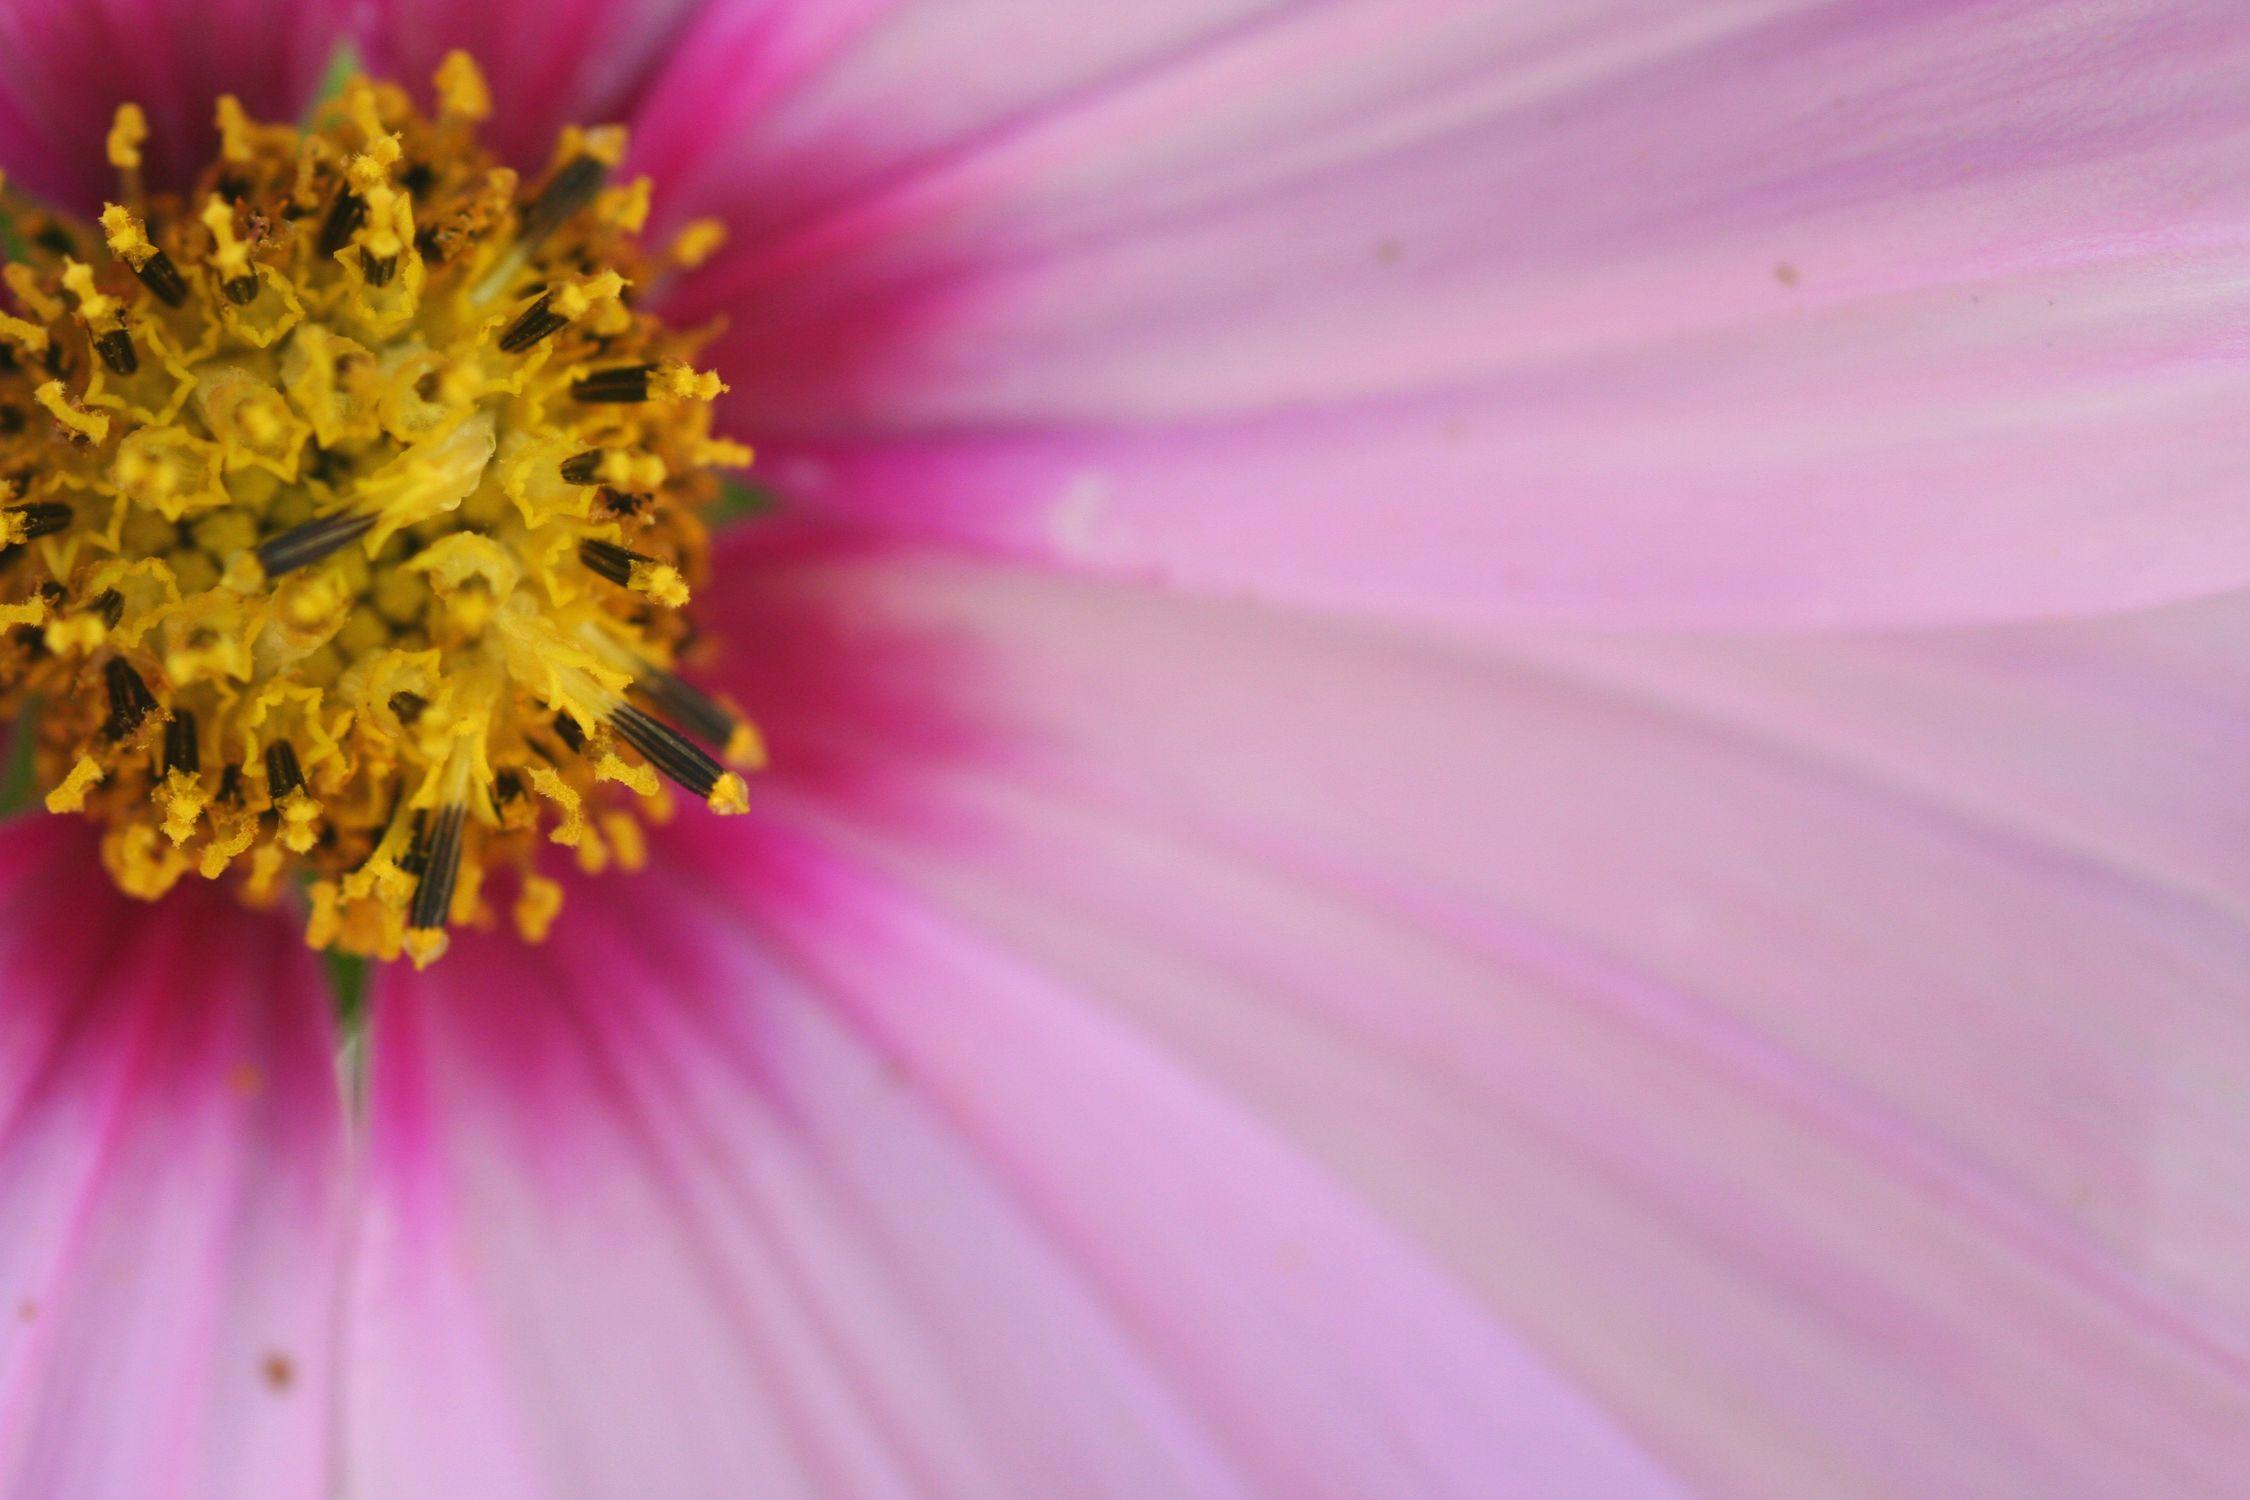 Bild mit Farben, Gelb, Natur, Pflanzen, Blumen, Rosa, Lila, Violett, Korbblütler